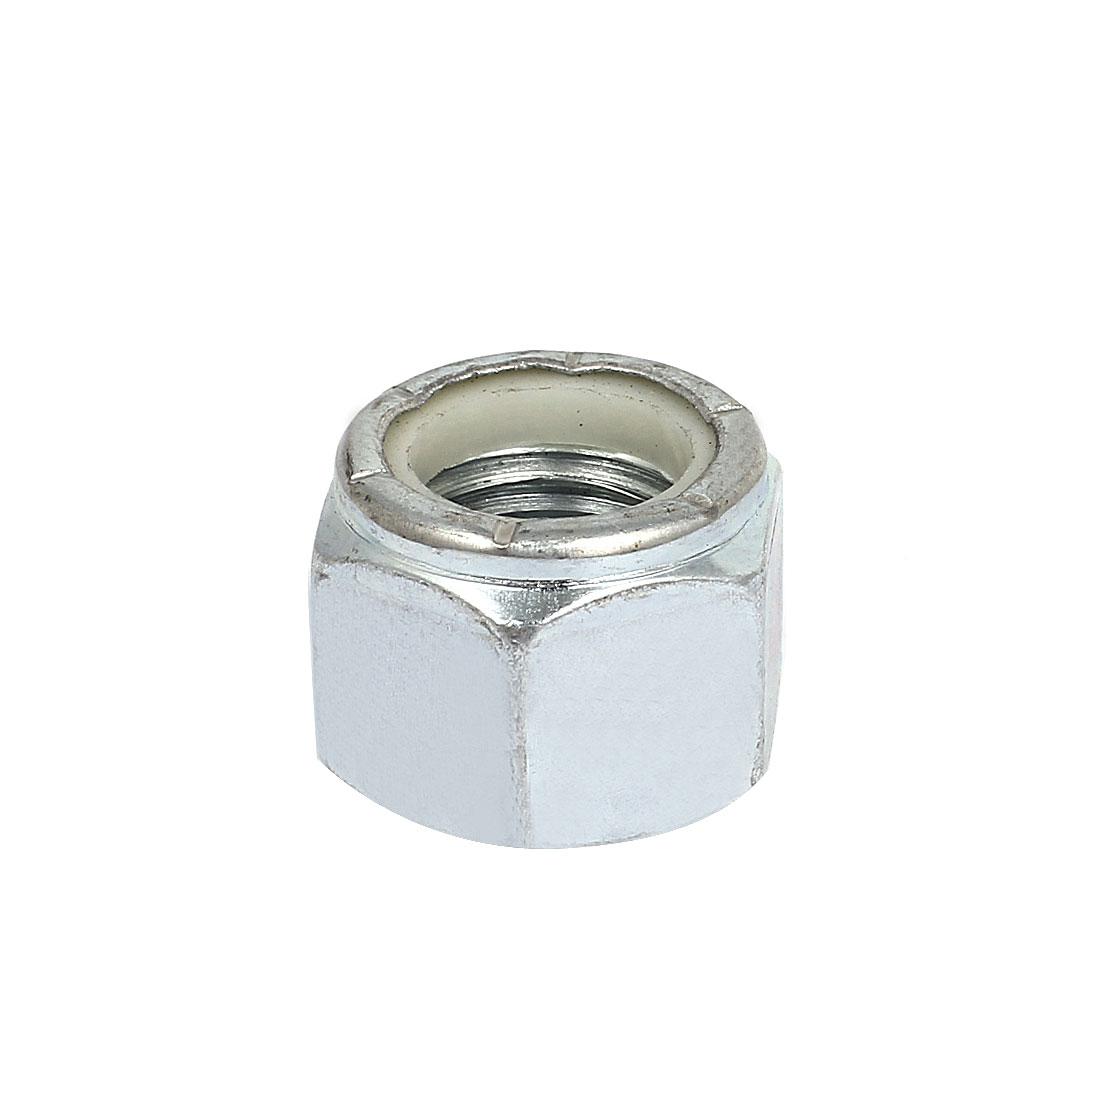 "7/8""-9 Zinc Plated Nylock Self-Locking Nylon Insert Hex Lock Nuts"